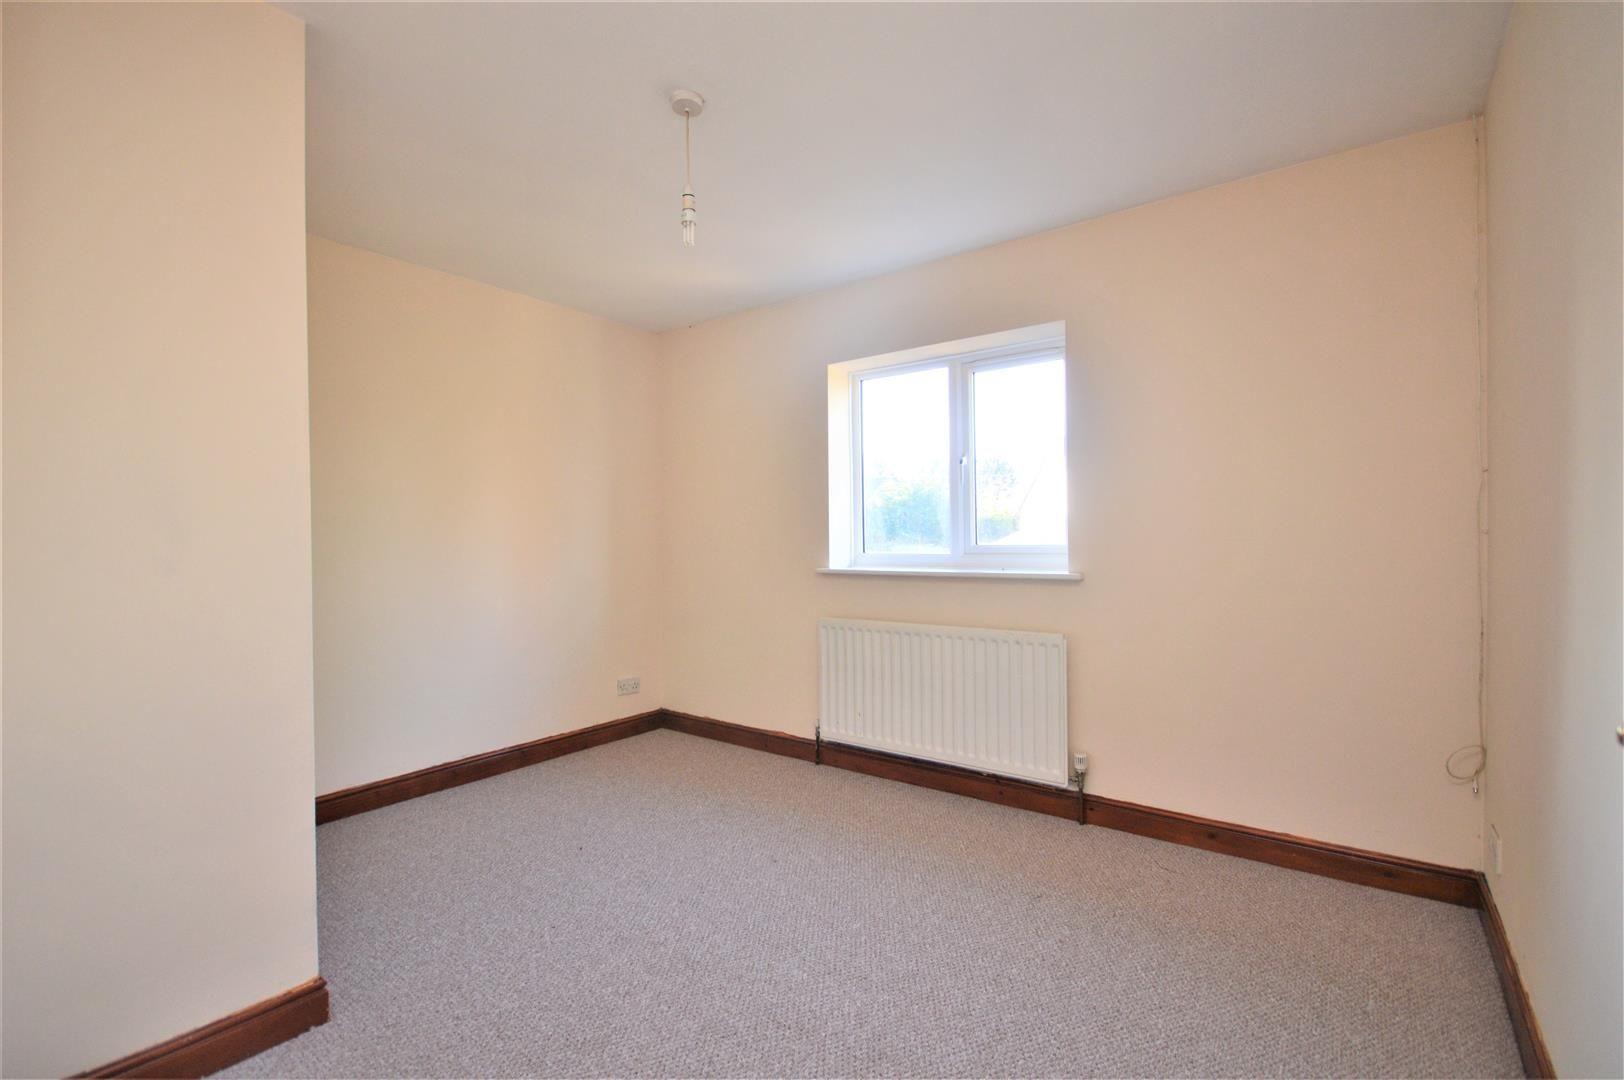 2 bed terraced for sale in Lower Bullingham 6